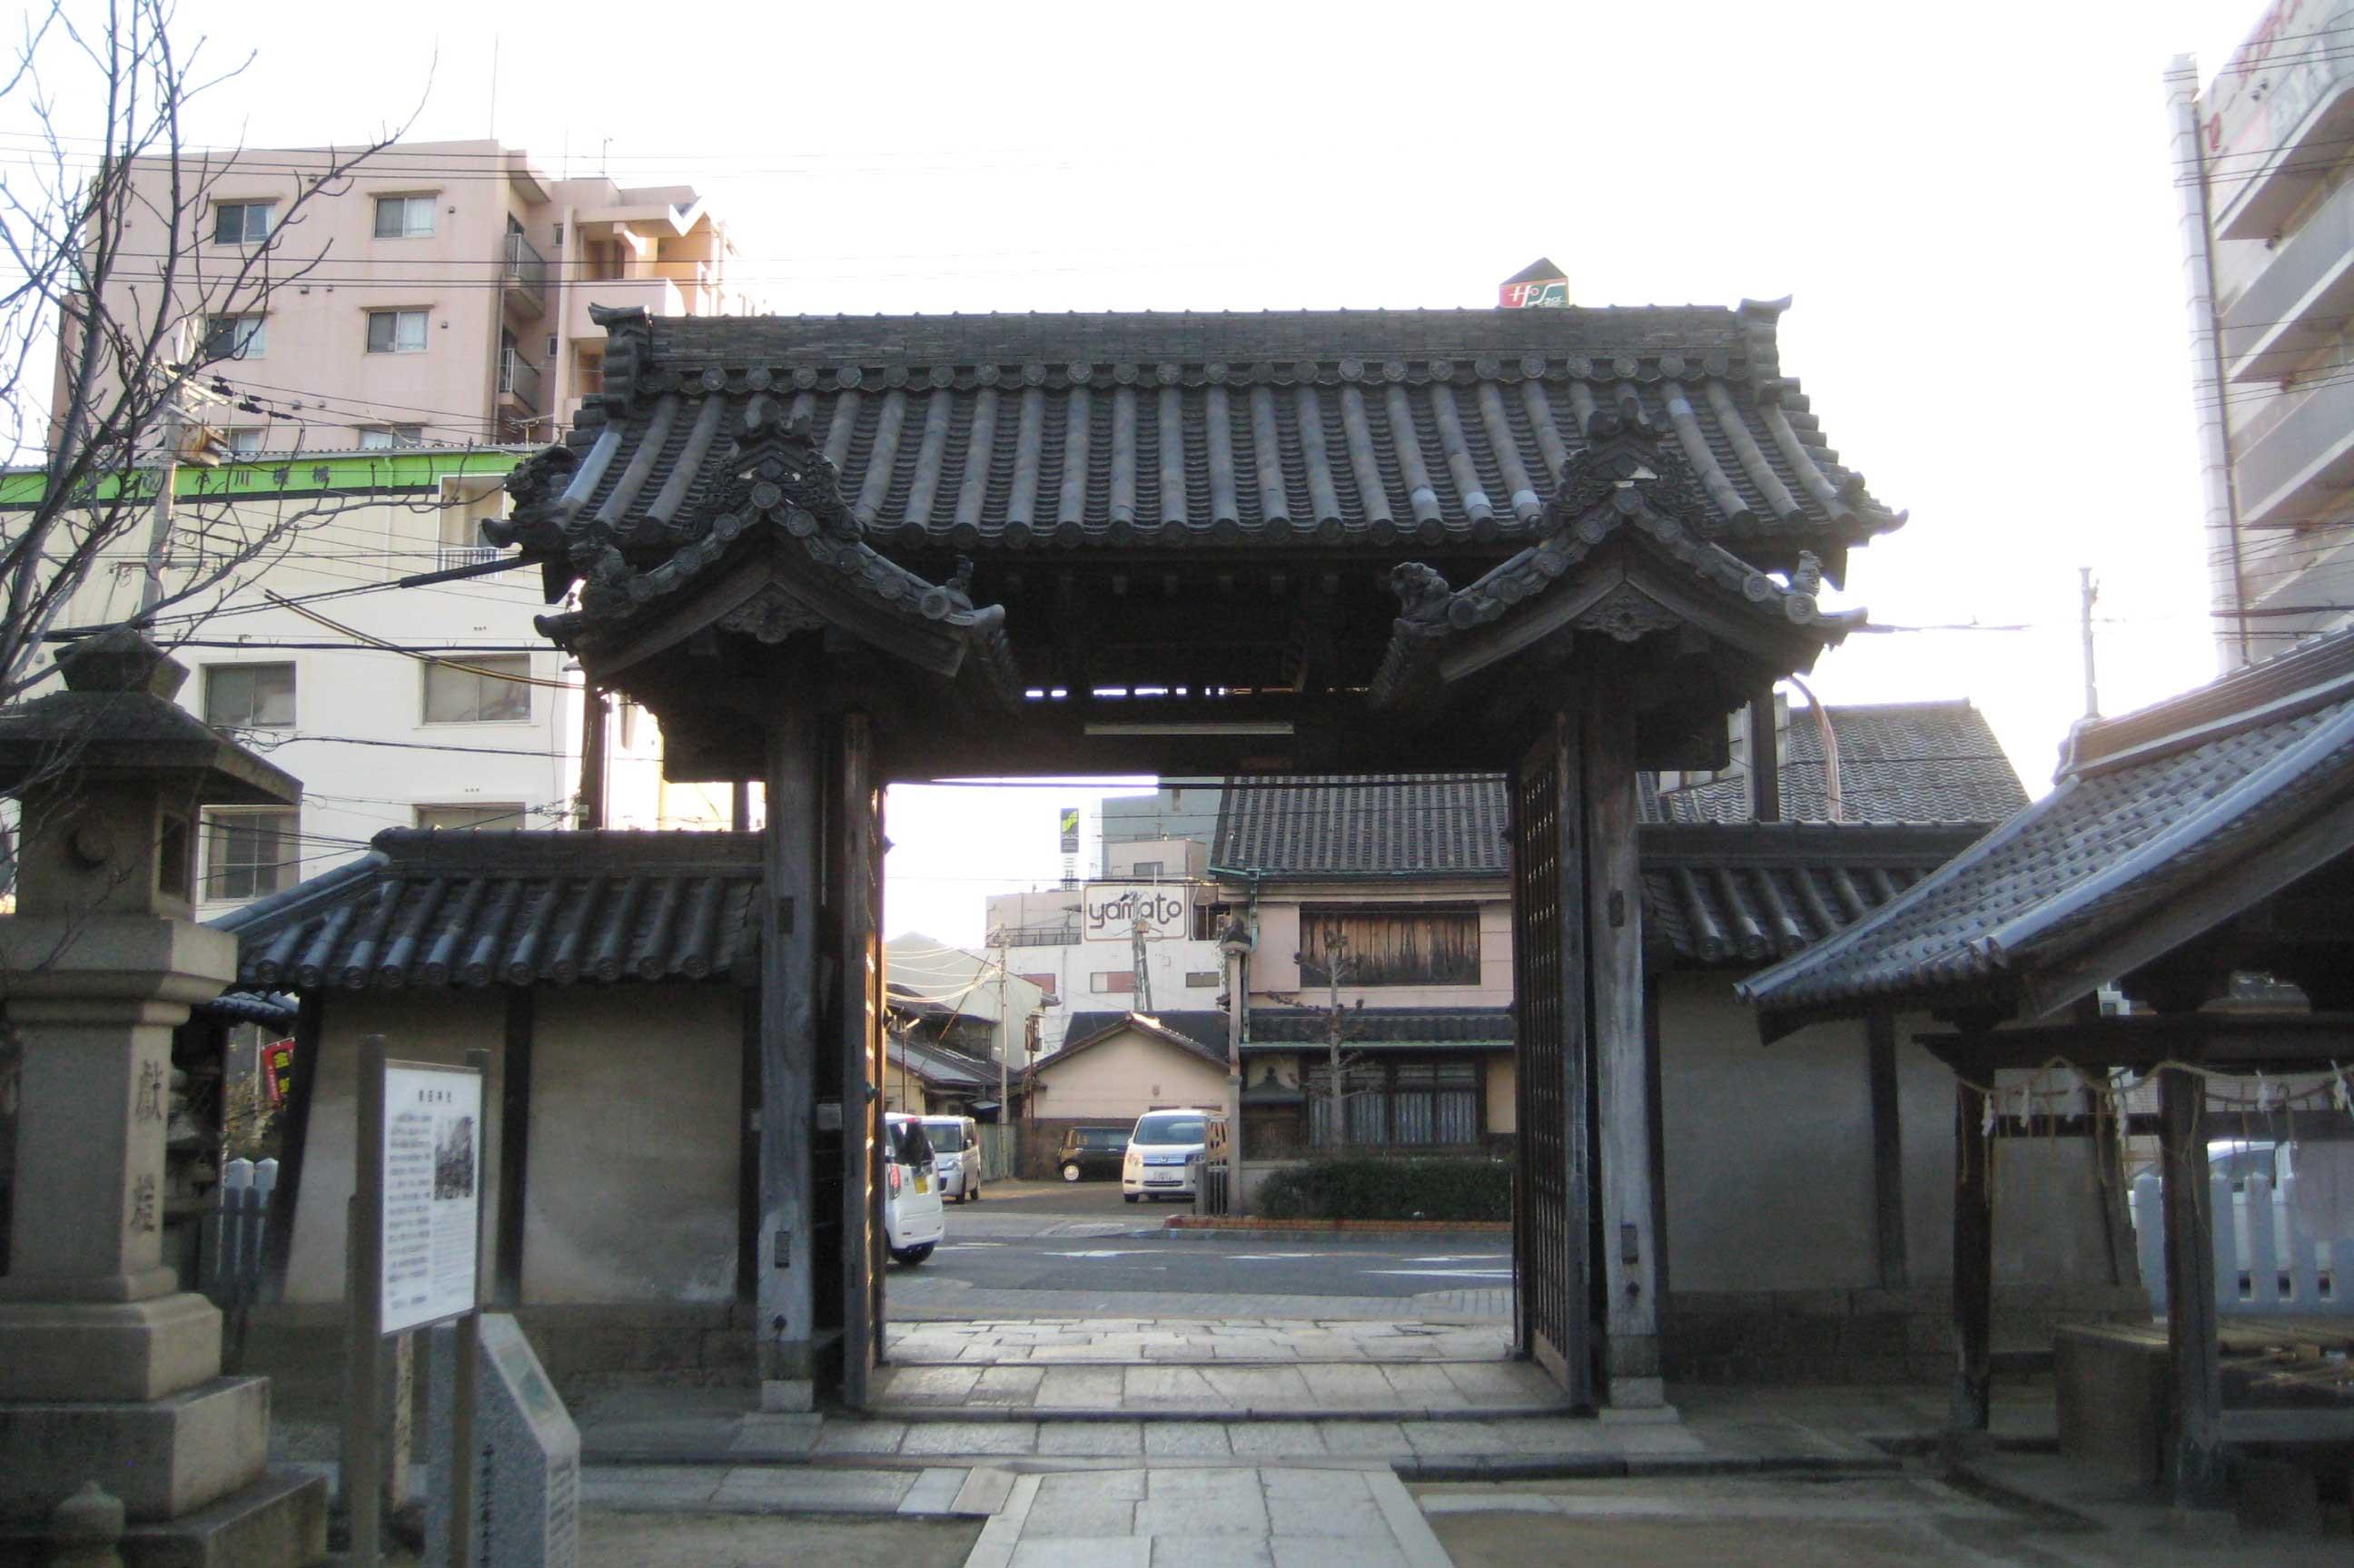 <p>南門 背面(境内側)</p>在平整的加工石礎上立五平柱(扁平状柱子剖面),以門楣相固。以肘木和斗所支承的梁,使檐桁出跳深遠。檐為単檐疎椽。